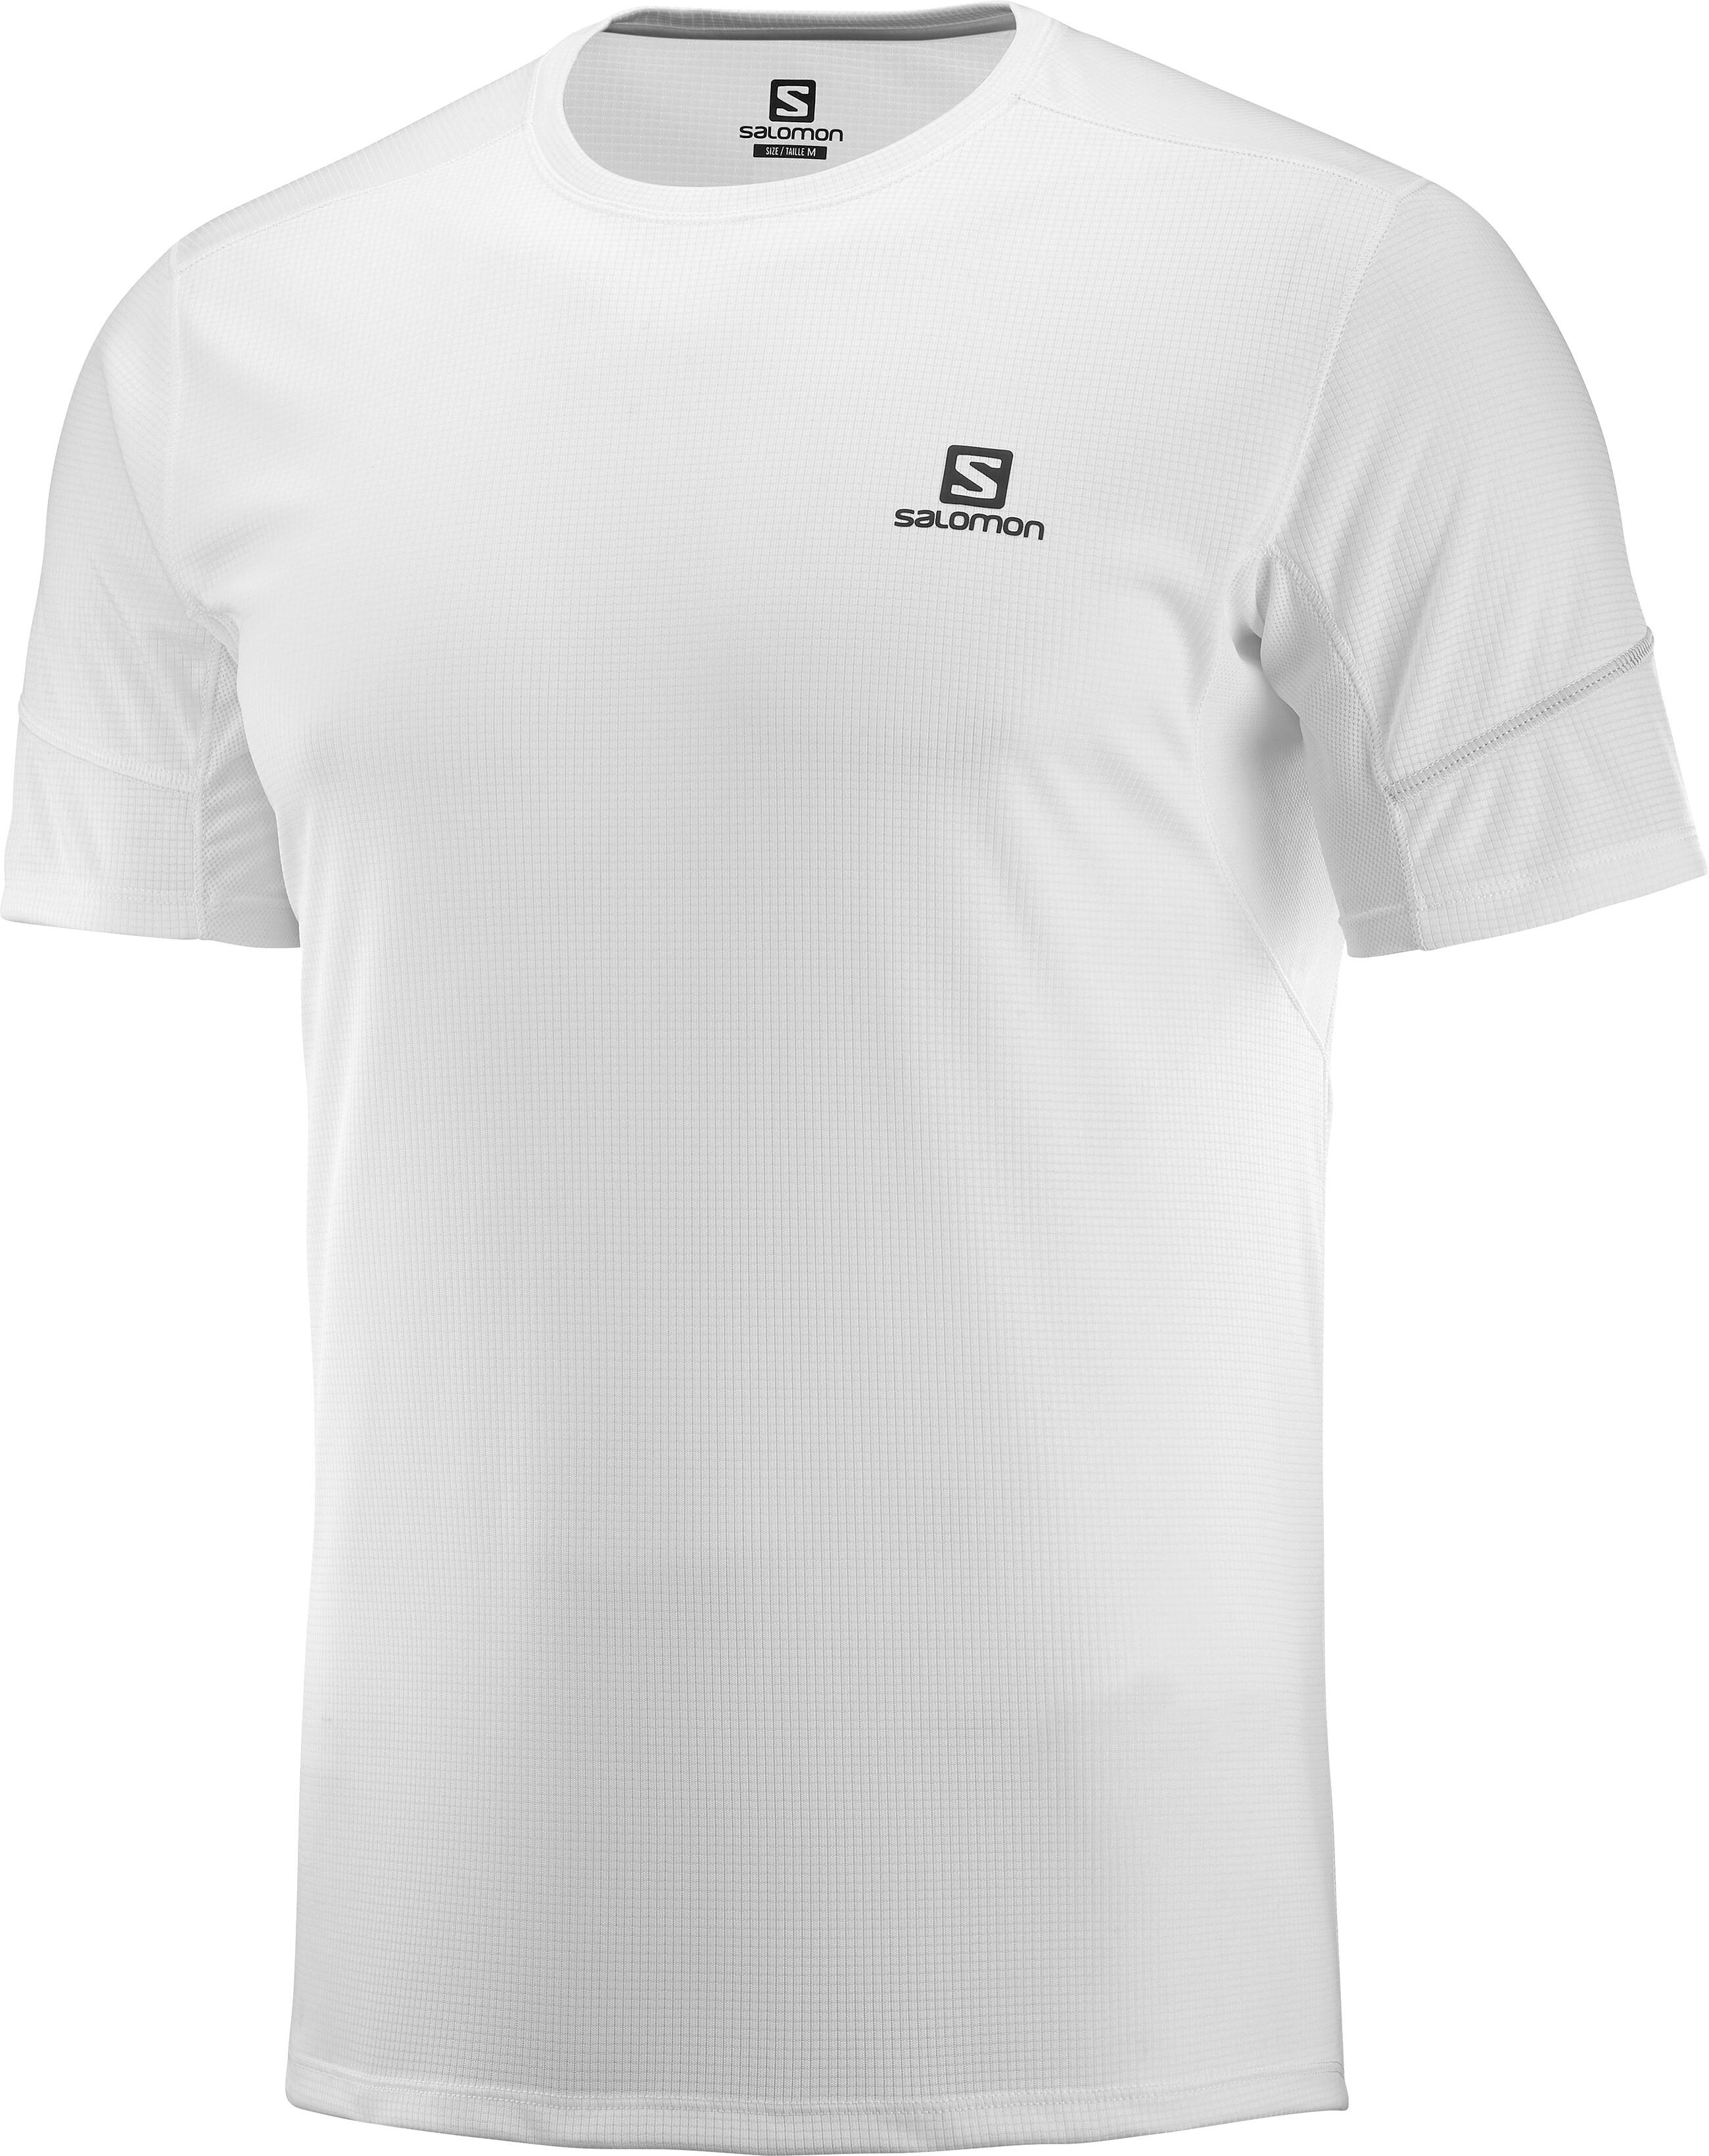 1442a463bd4 Salomon Agile Hardloopshirt korte mouwen Heren wit l Outdoor winkel ...